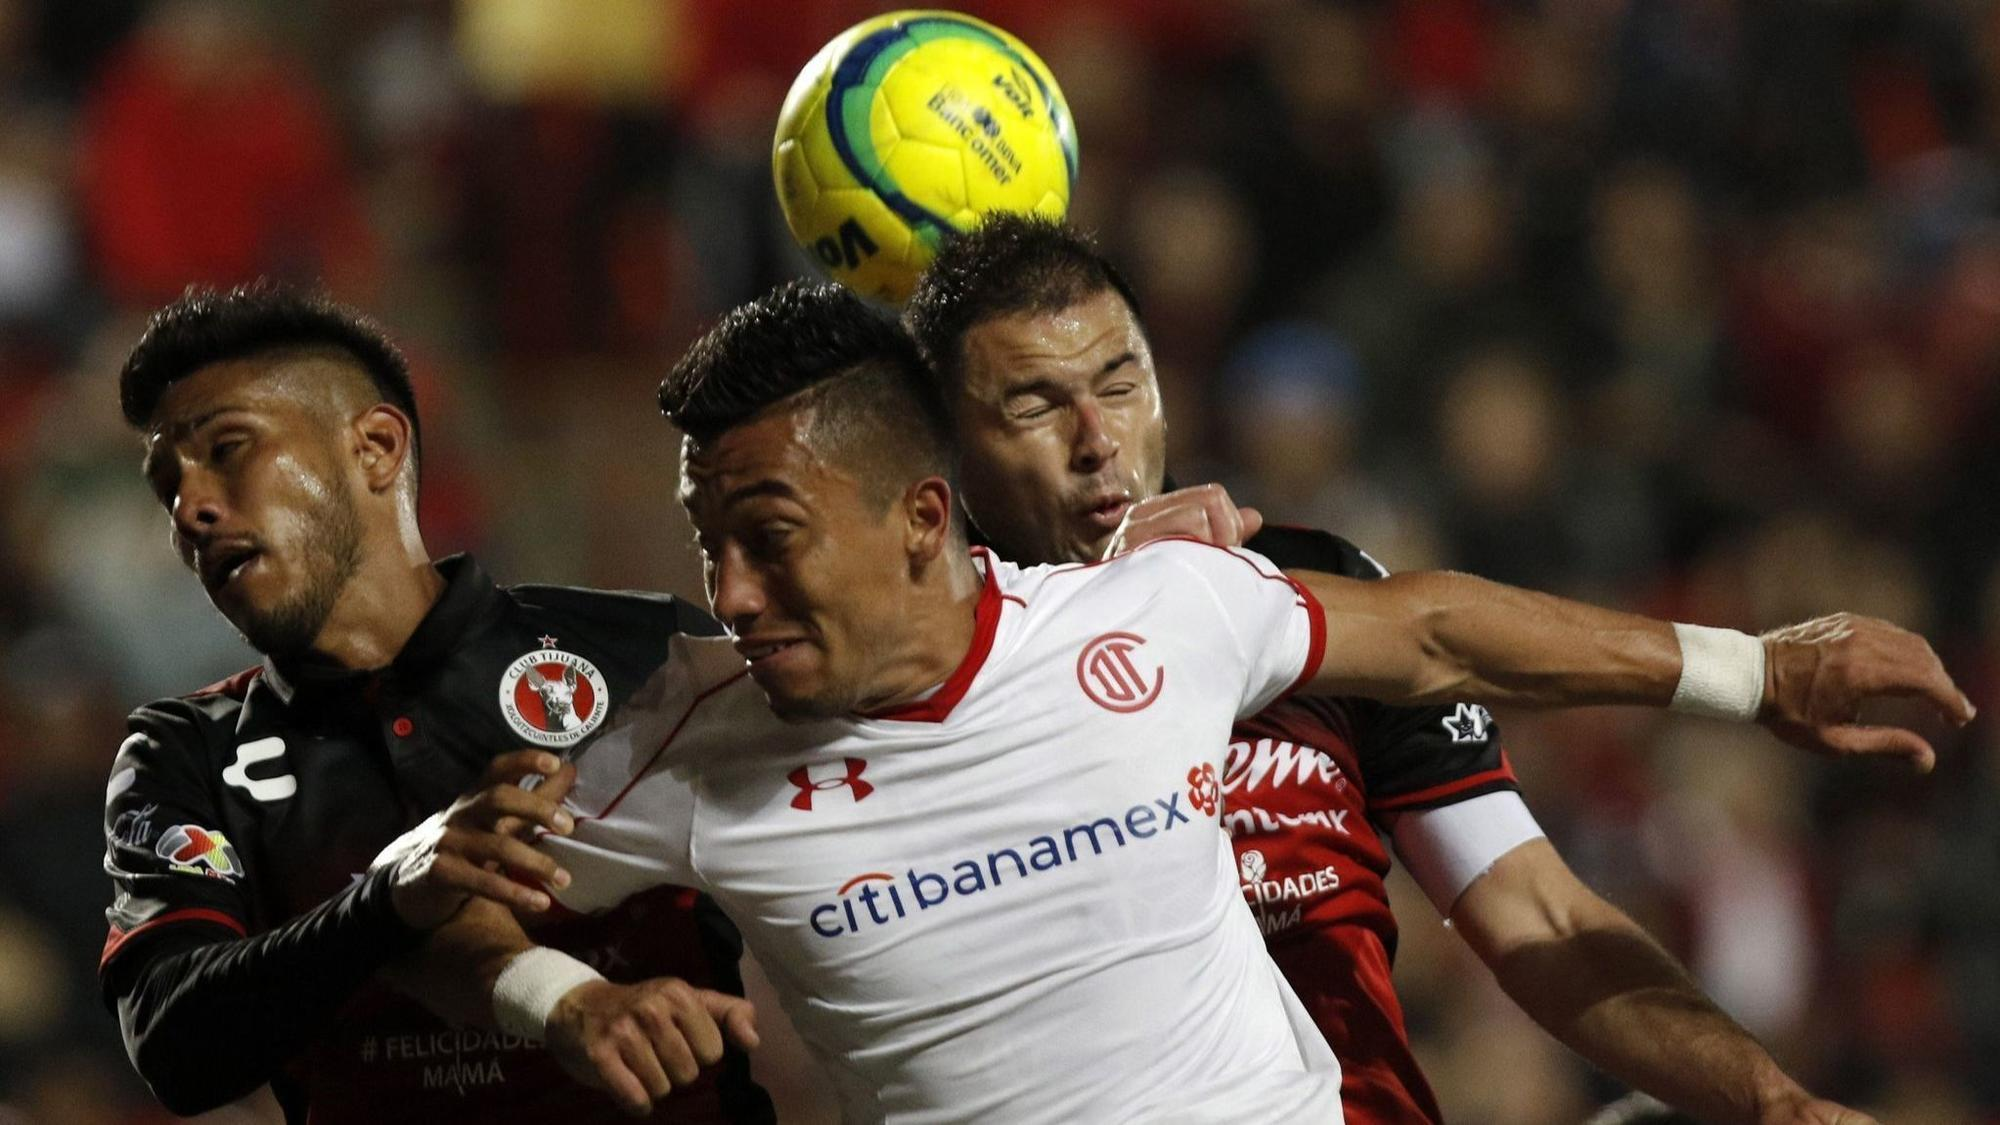 Sd-sp-tijuana-xolos-toluca-mexico-soccer-20180510